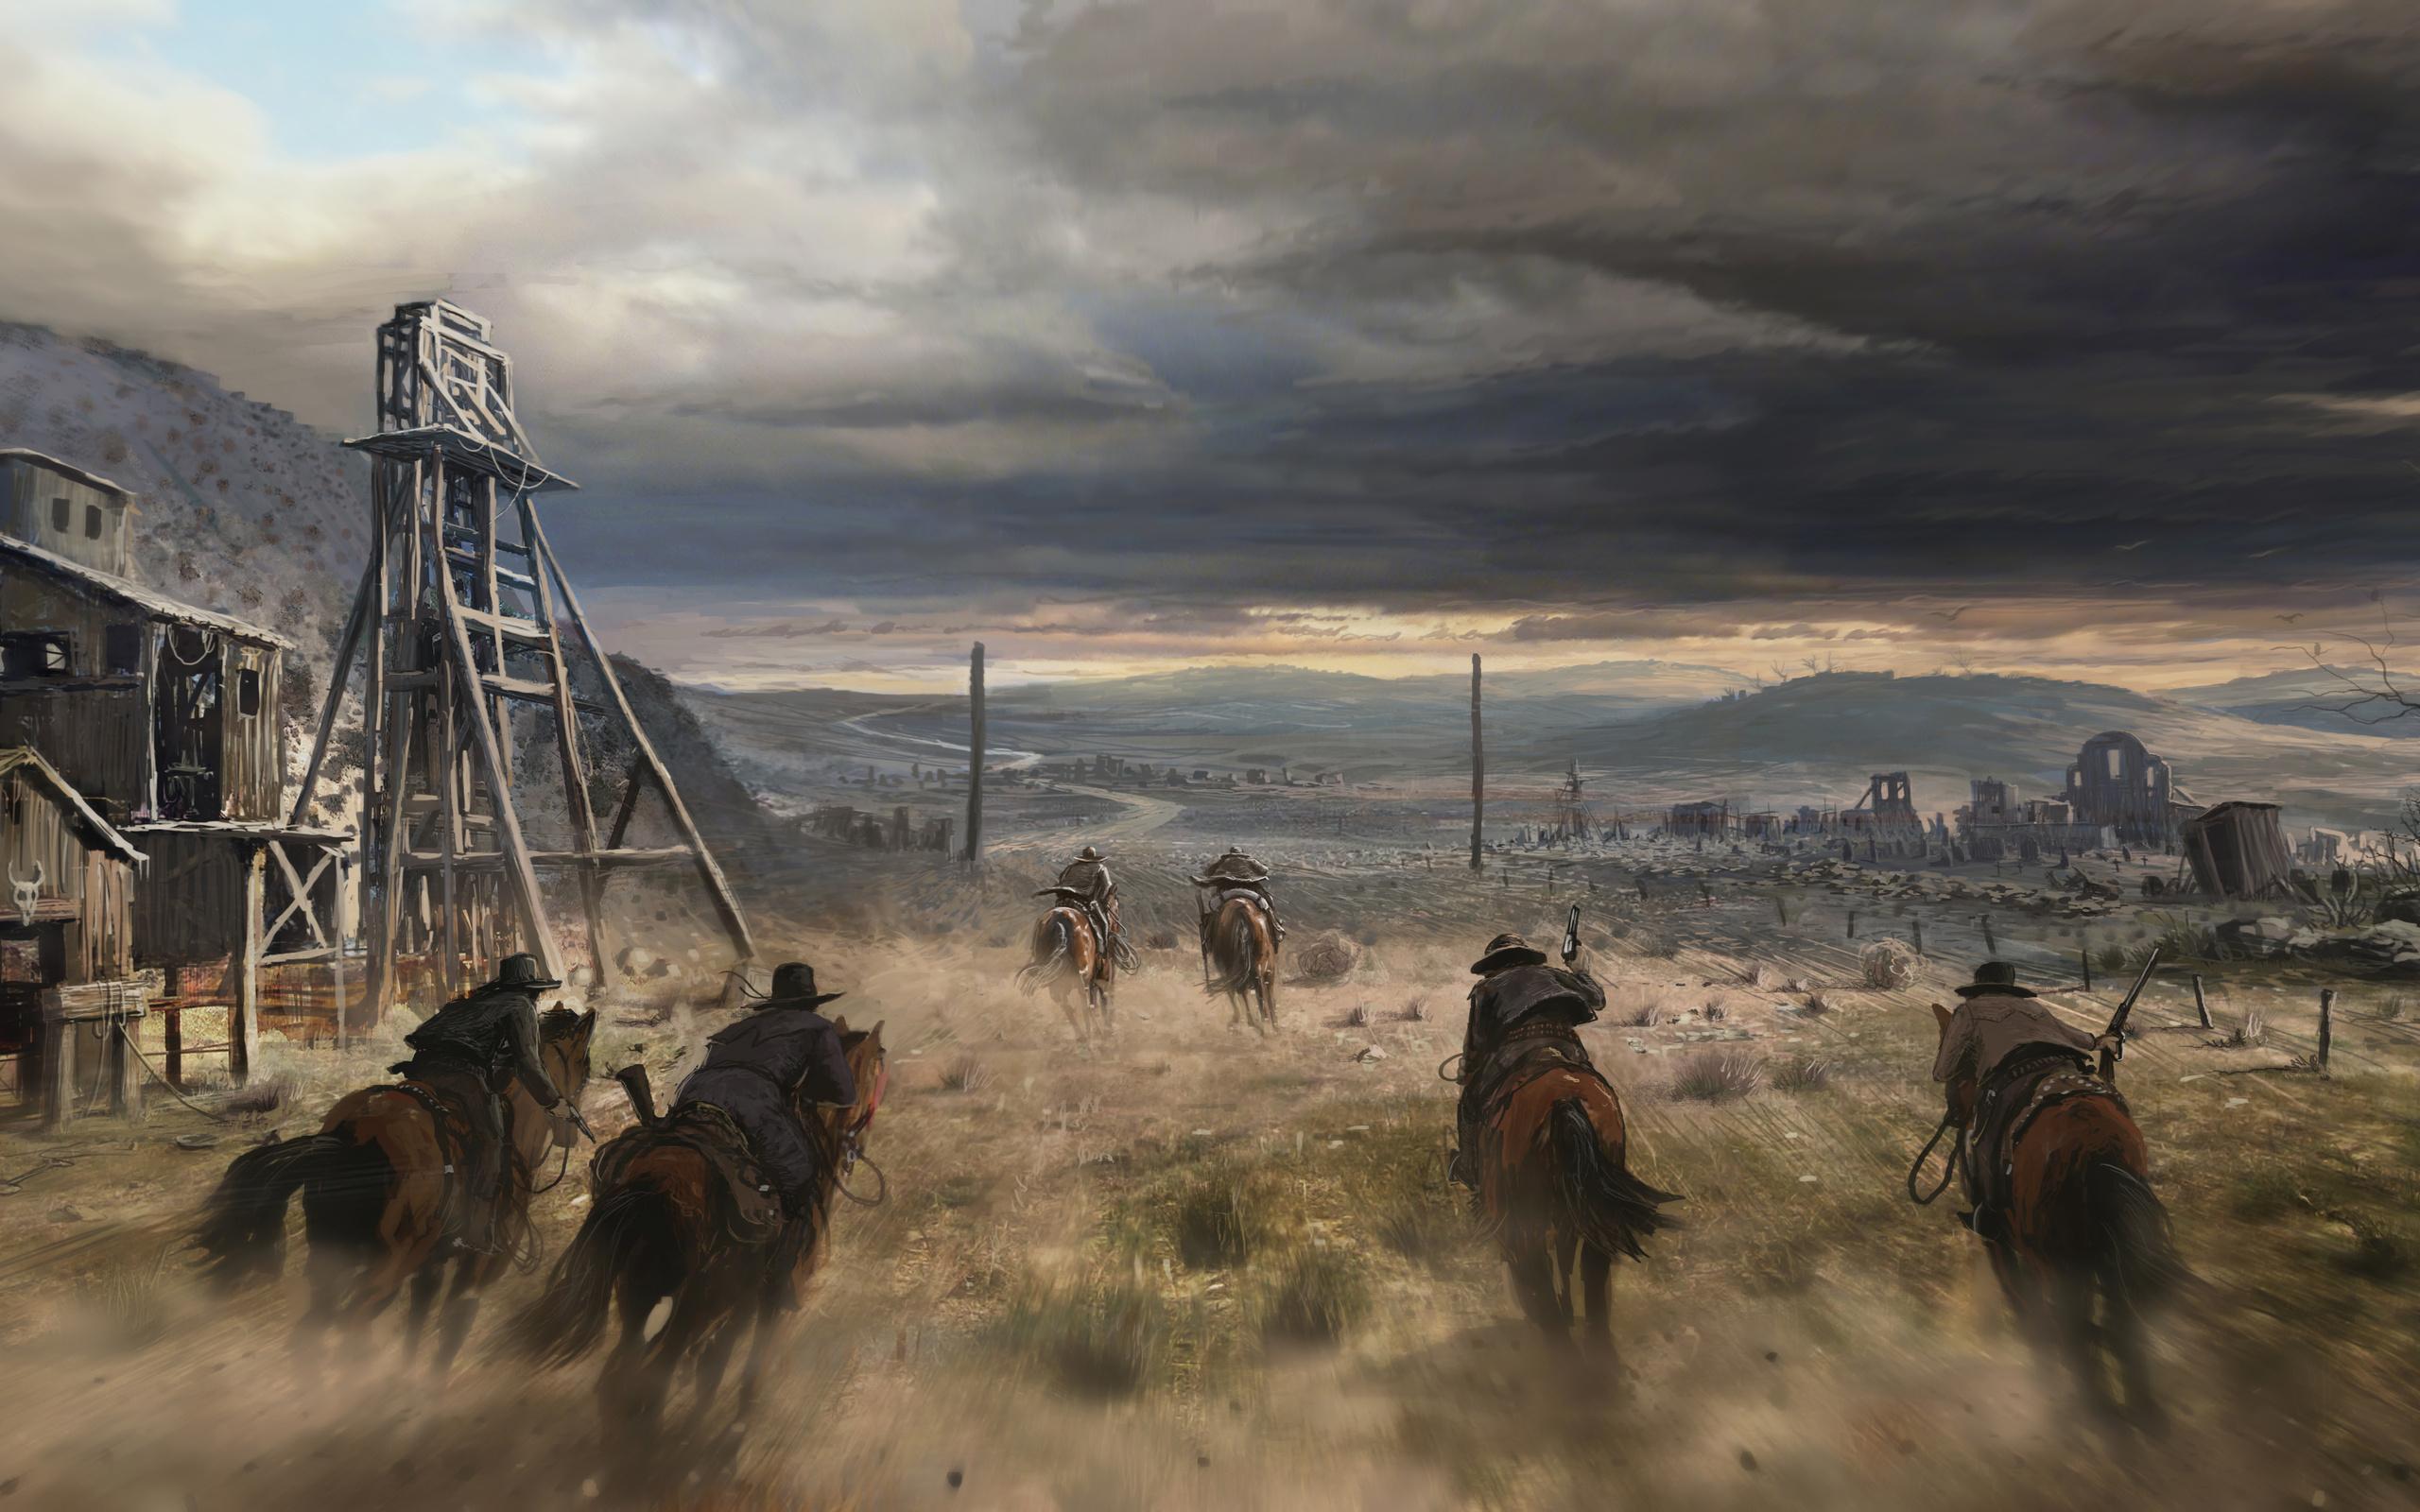 Cowboys california gold rush america usa wallpaper 2560x1600